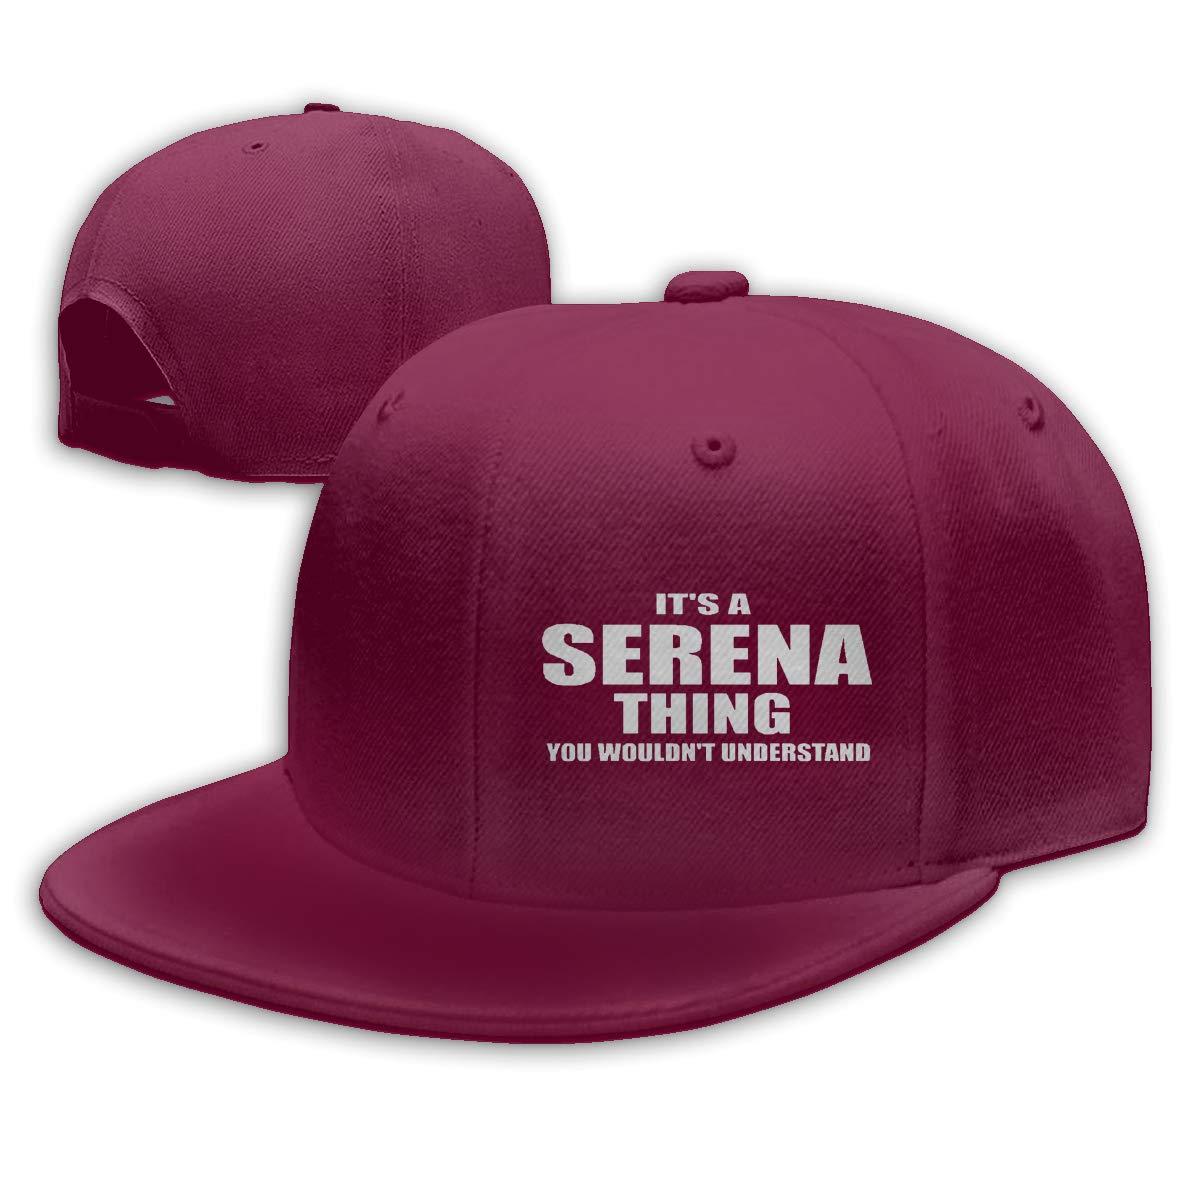 Haggai Romeo Unisex Tennis S-Erena W-illiams Snapback Baseball Cap Flat Brim Hip Hop Hat Adjustable Dad Hat